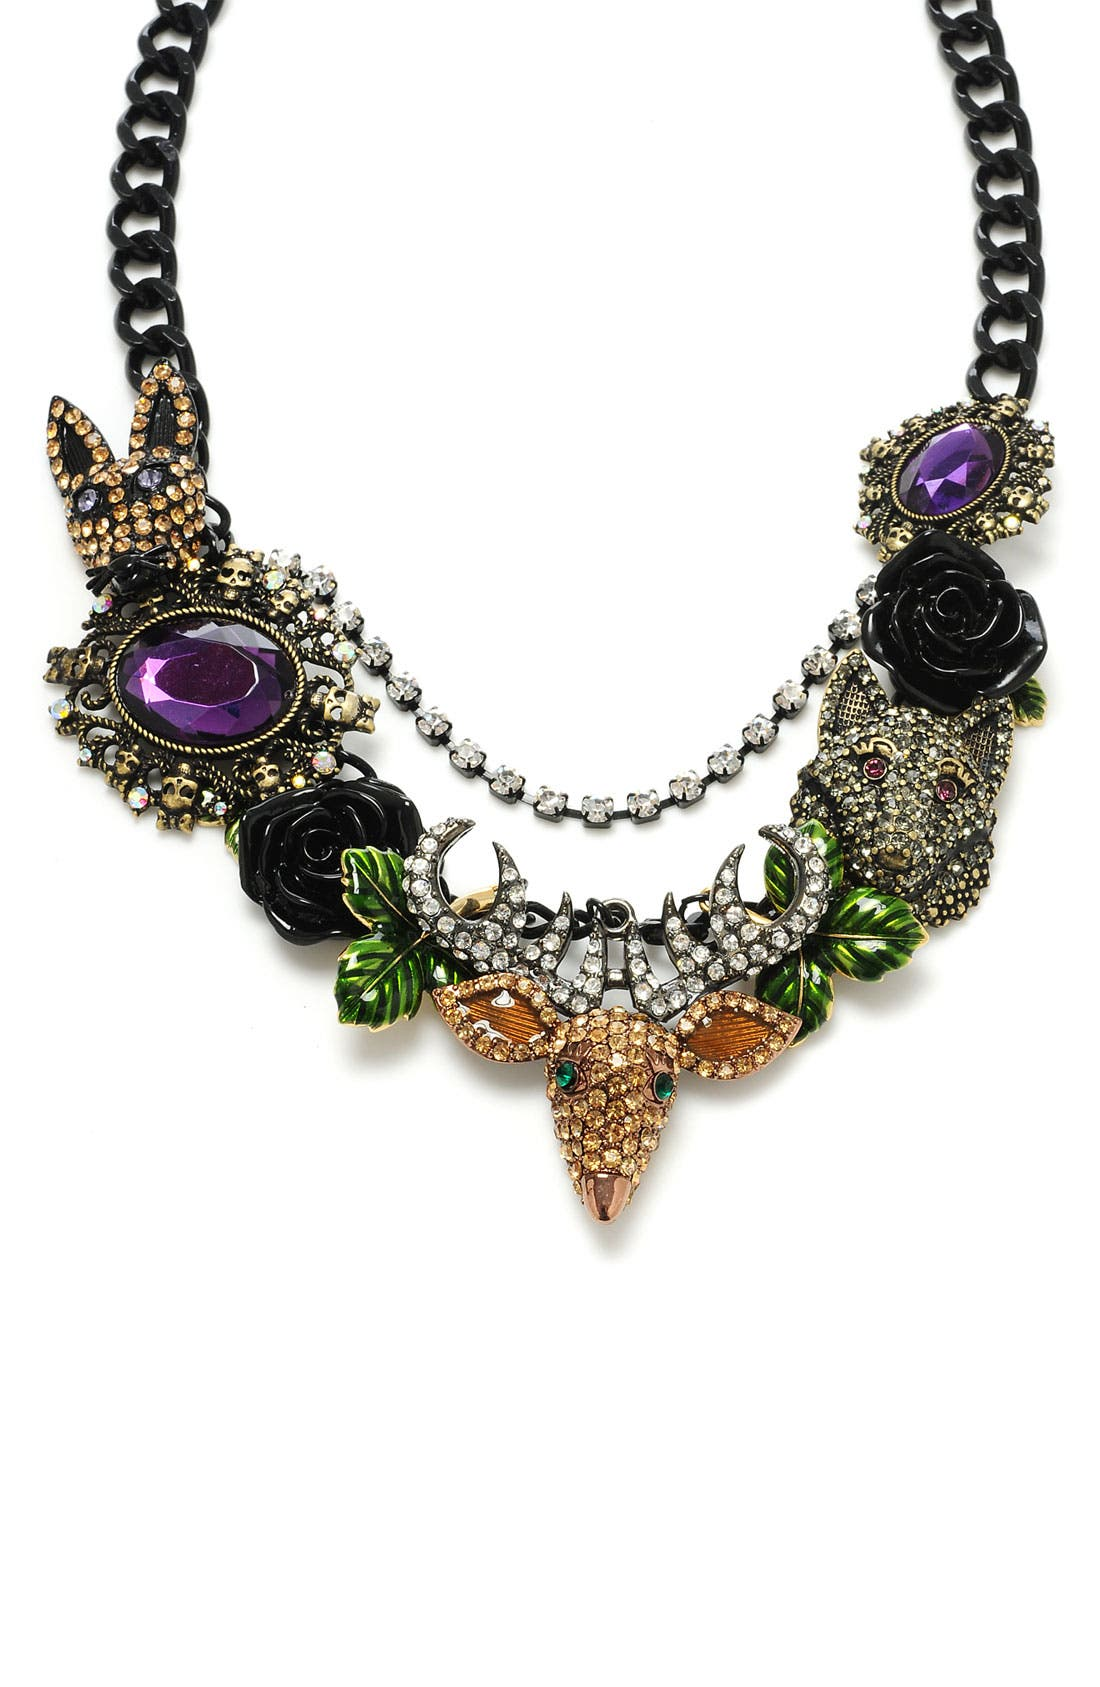 Main Image - Betsey Johnson 'Dark Forest' Animal Charm Necklace